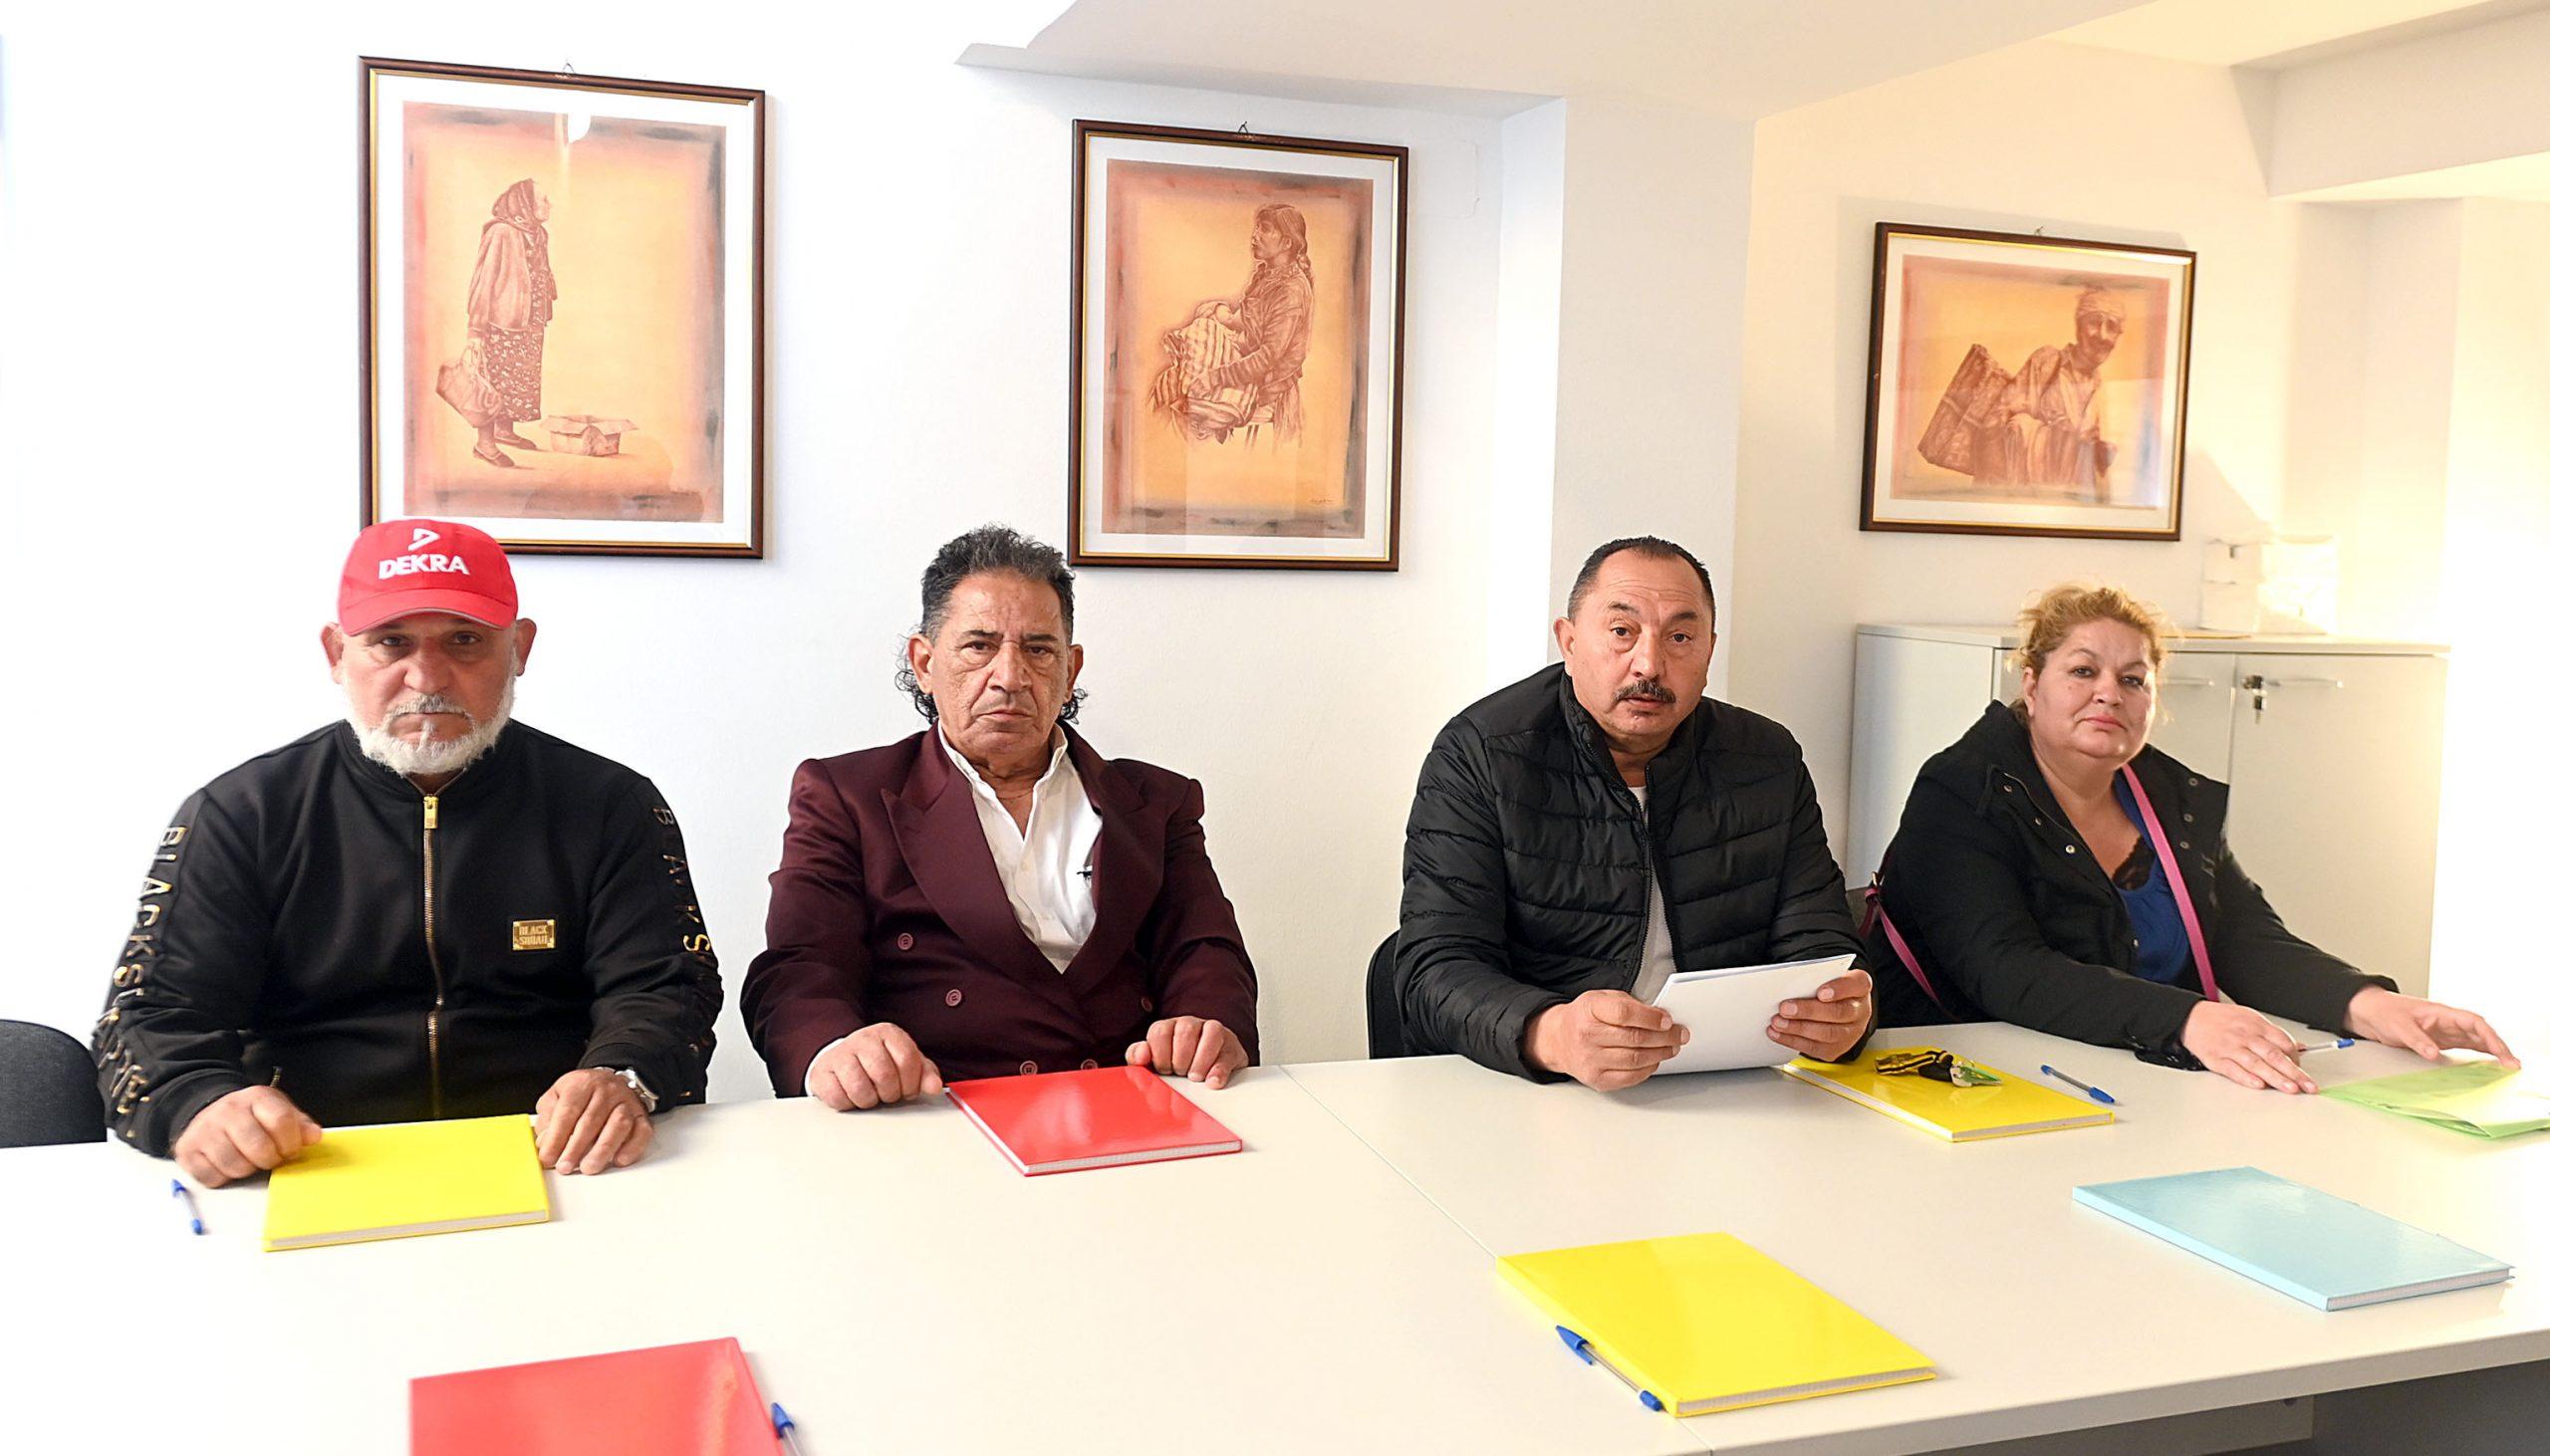 Jusufi Sami, Neziri Đerdet, Surija Mehmeti i Ceziban Mehmeti / Foto V. KARUZA